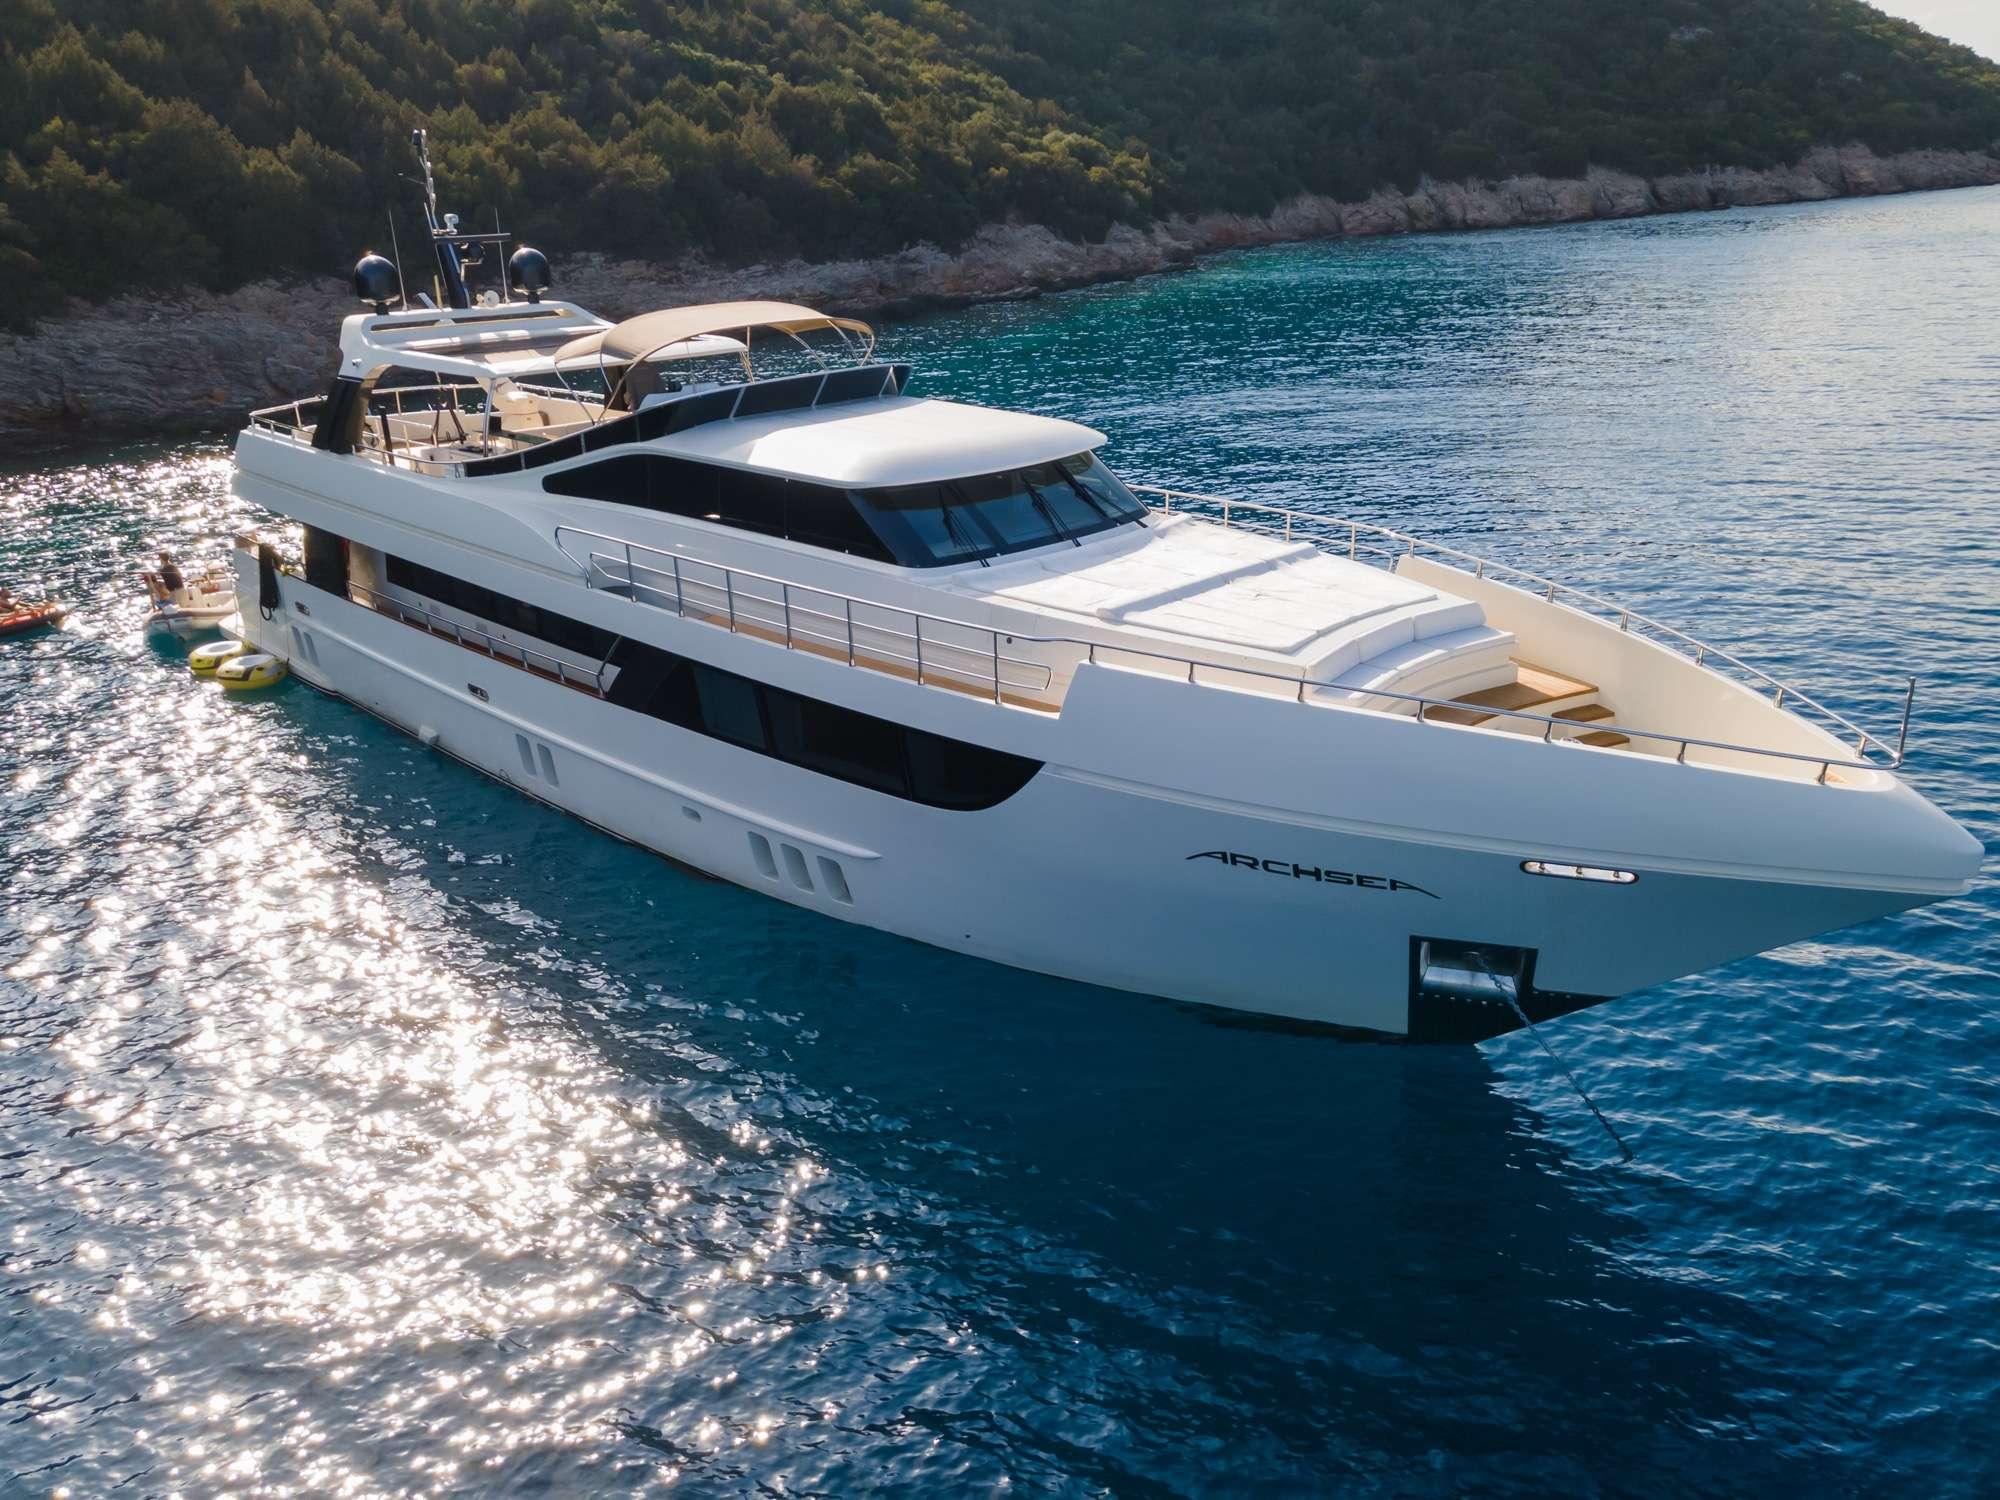 motor yacht ARCHSEA